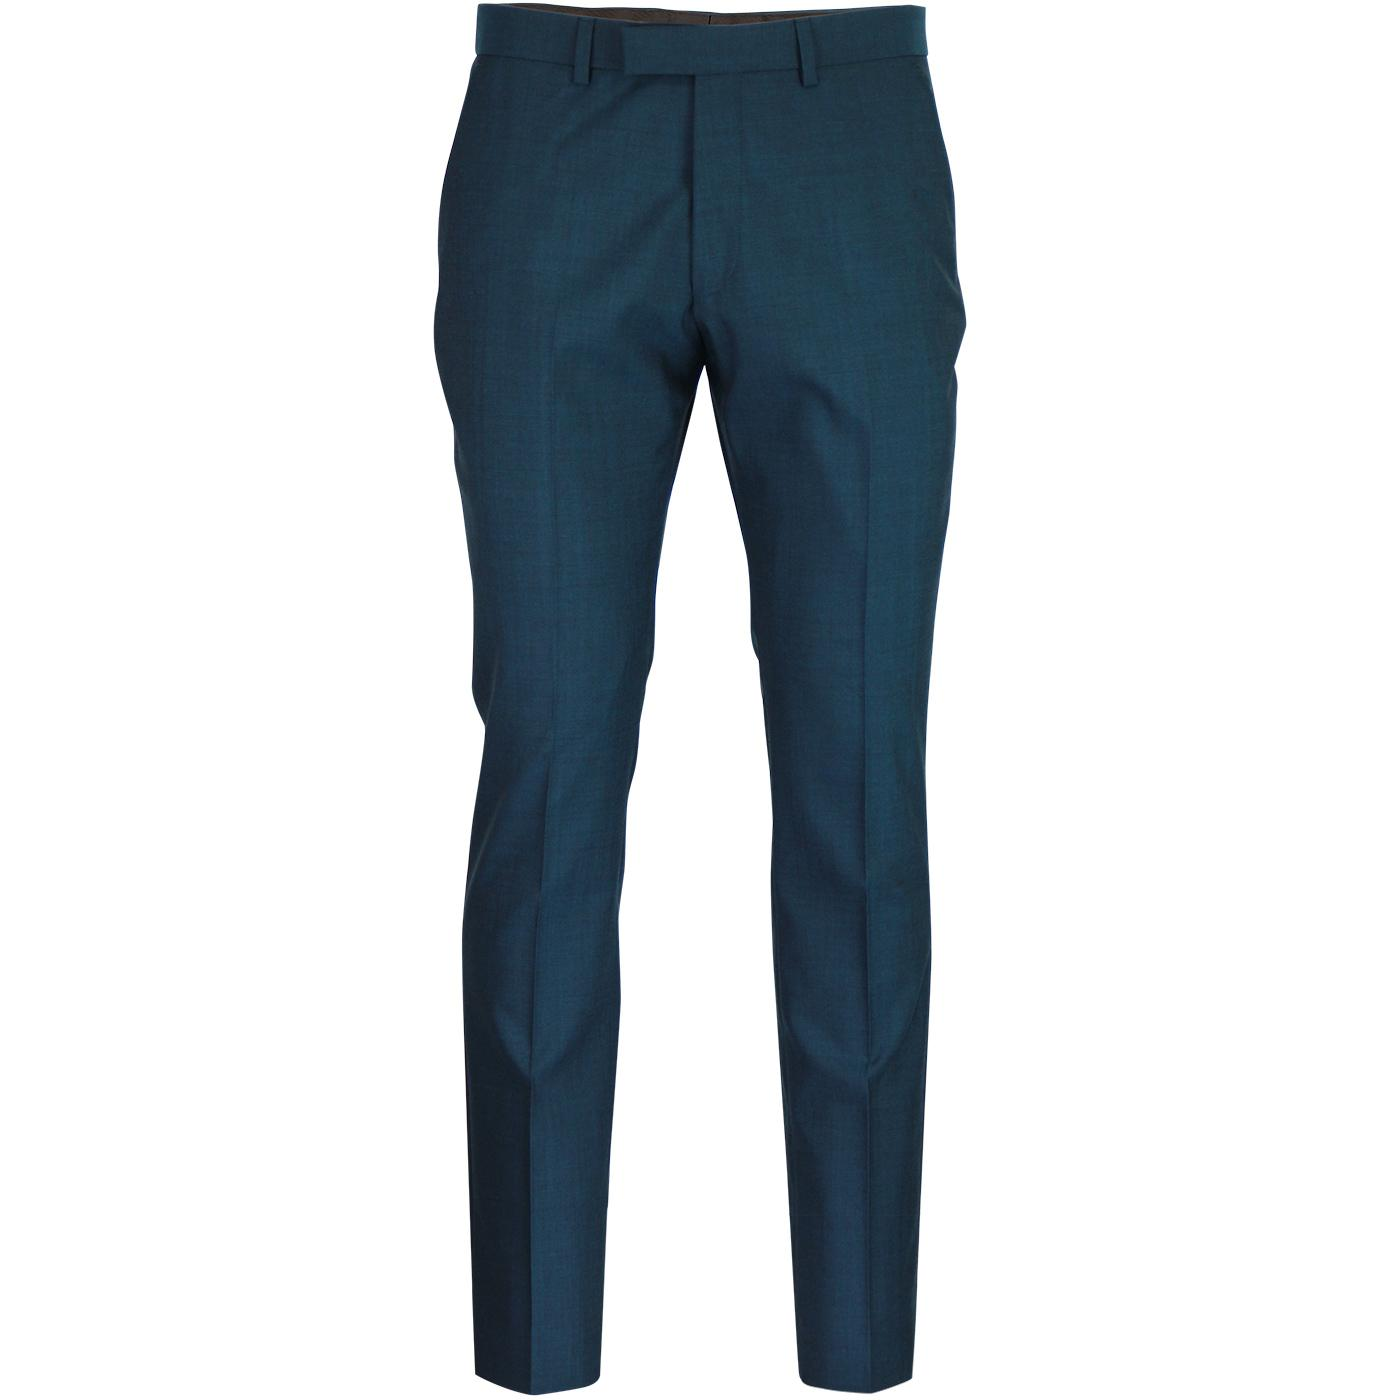 BEN SHERMAN Men's Mod Tonic Suit Trousers (Teal)